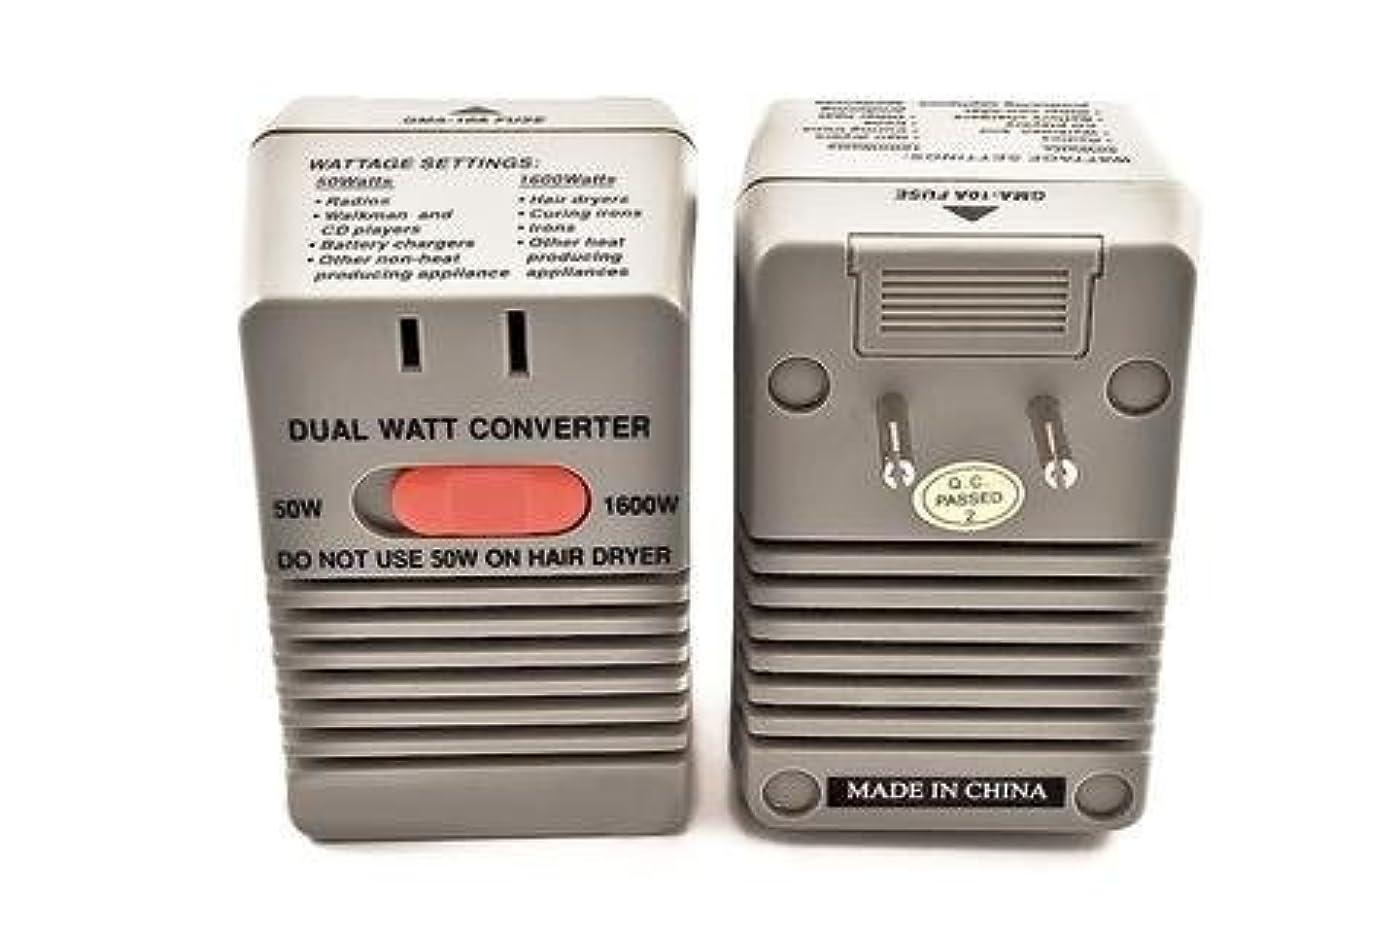 治安判事大洪水購入Simran SM-1650 Step Down Power Converter for International Travel Converts 220 Volt to 110 Volt,Dual Setting 50W...